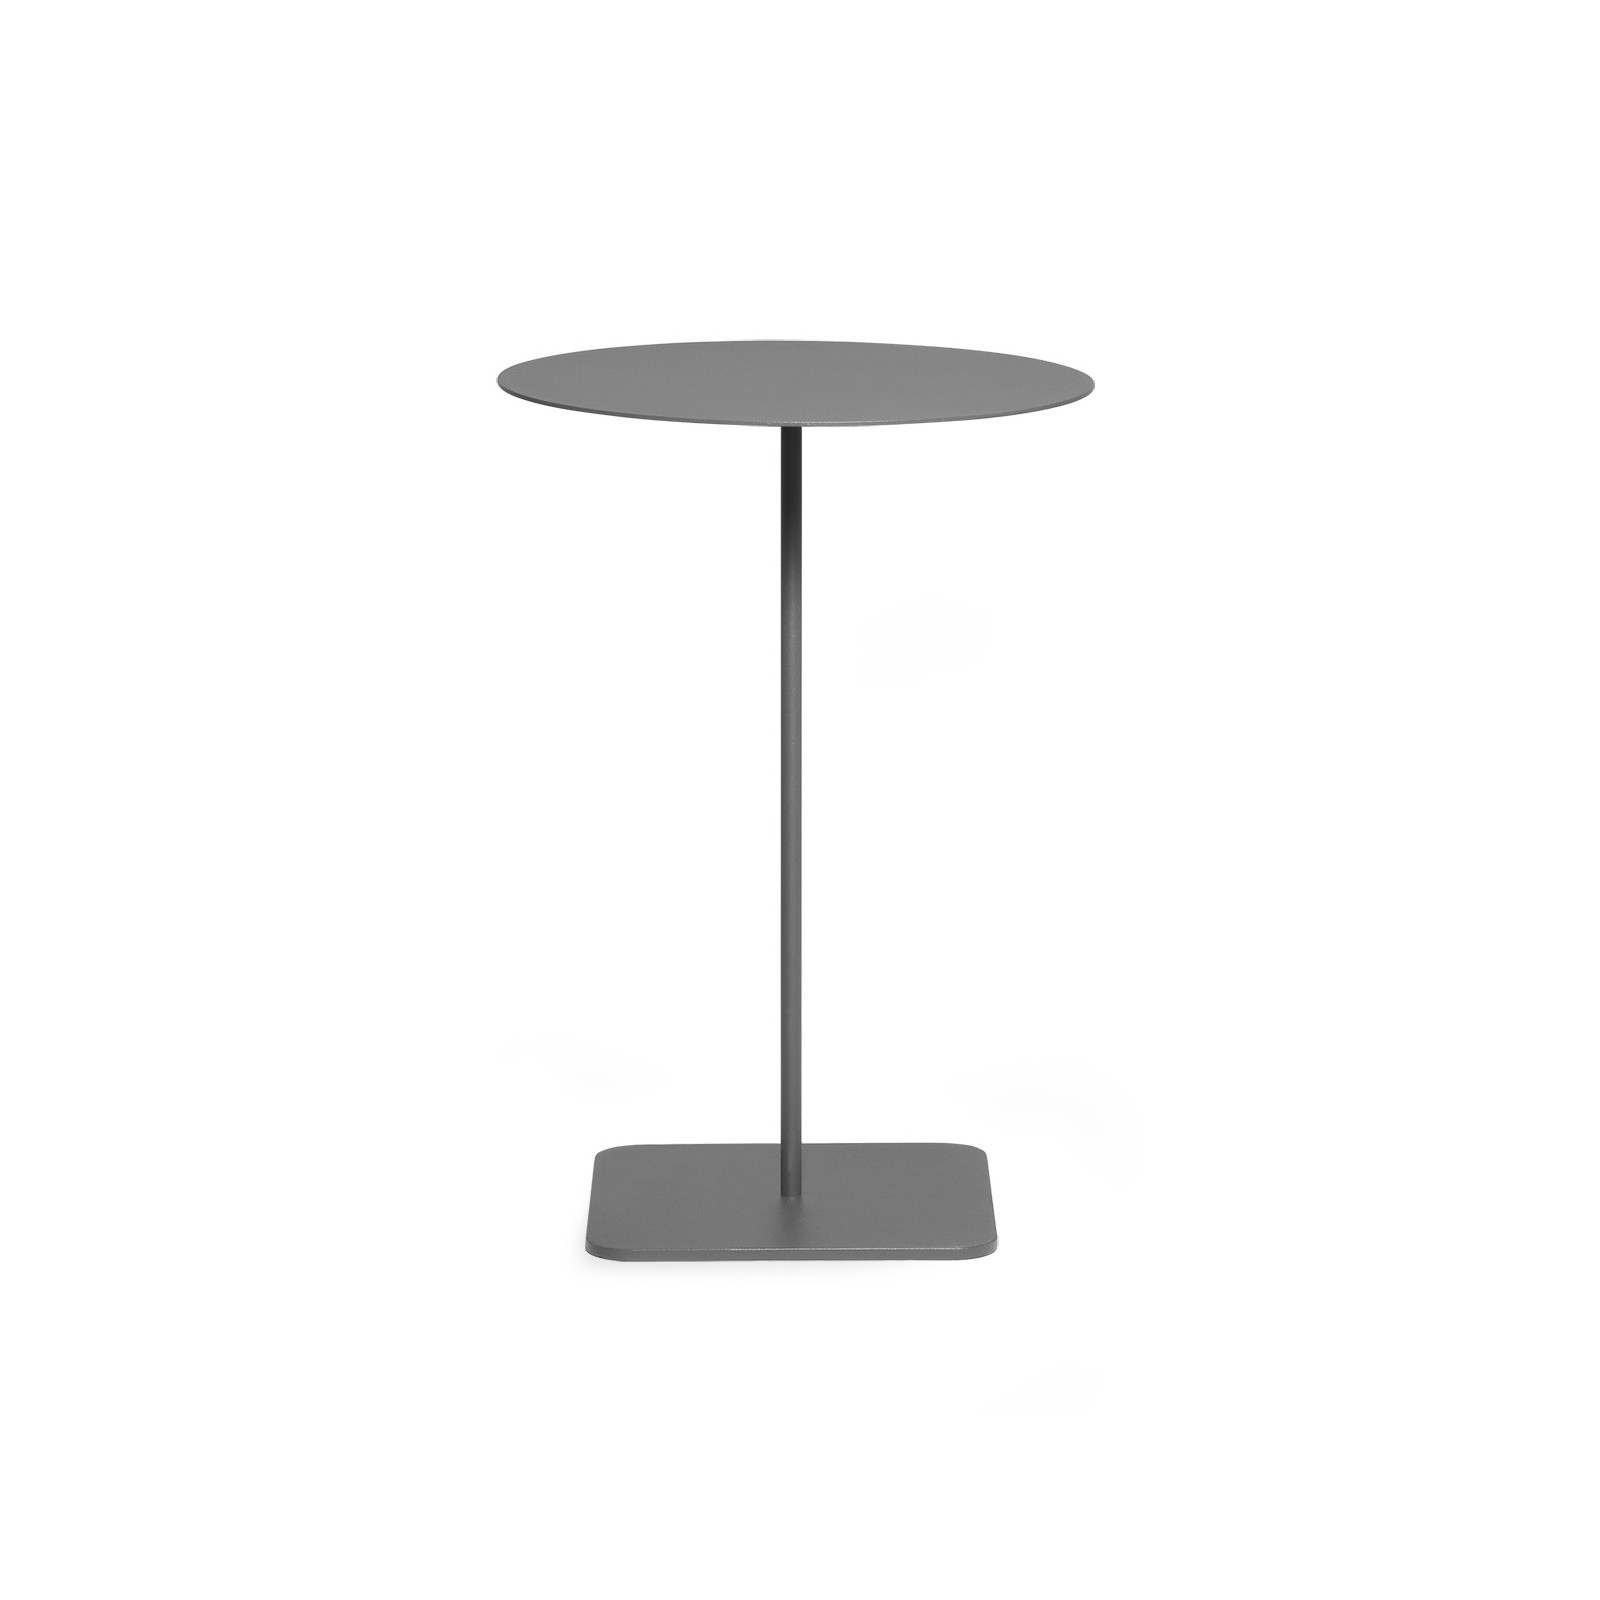 Mesita coffee table - 57 - grey